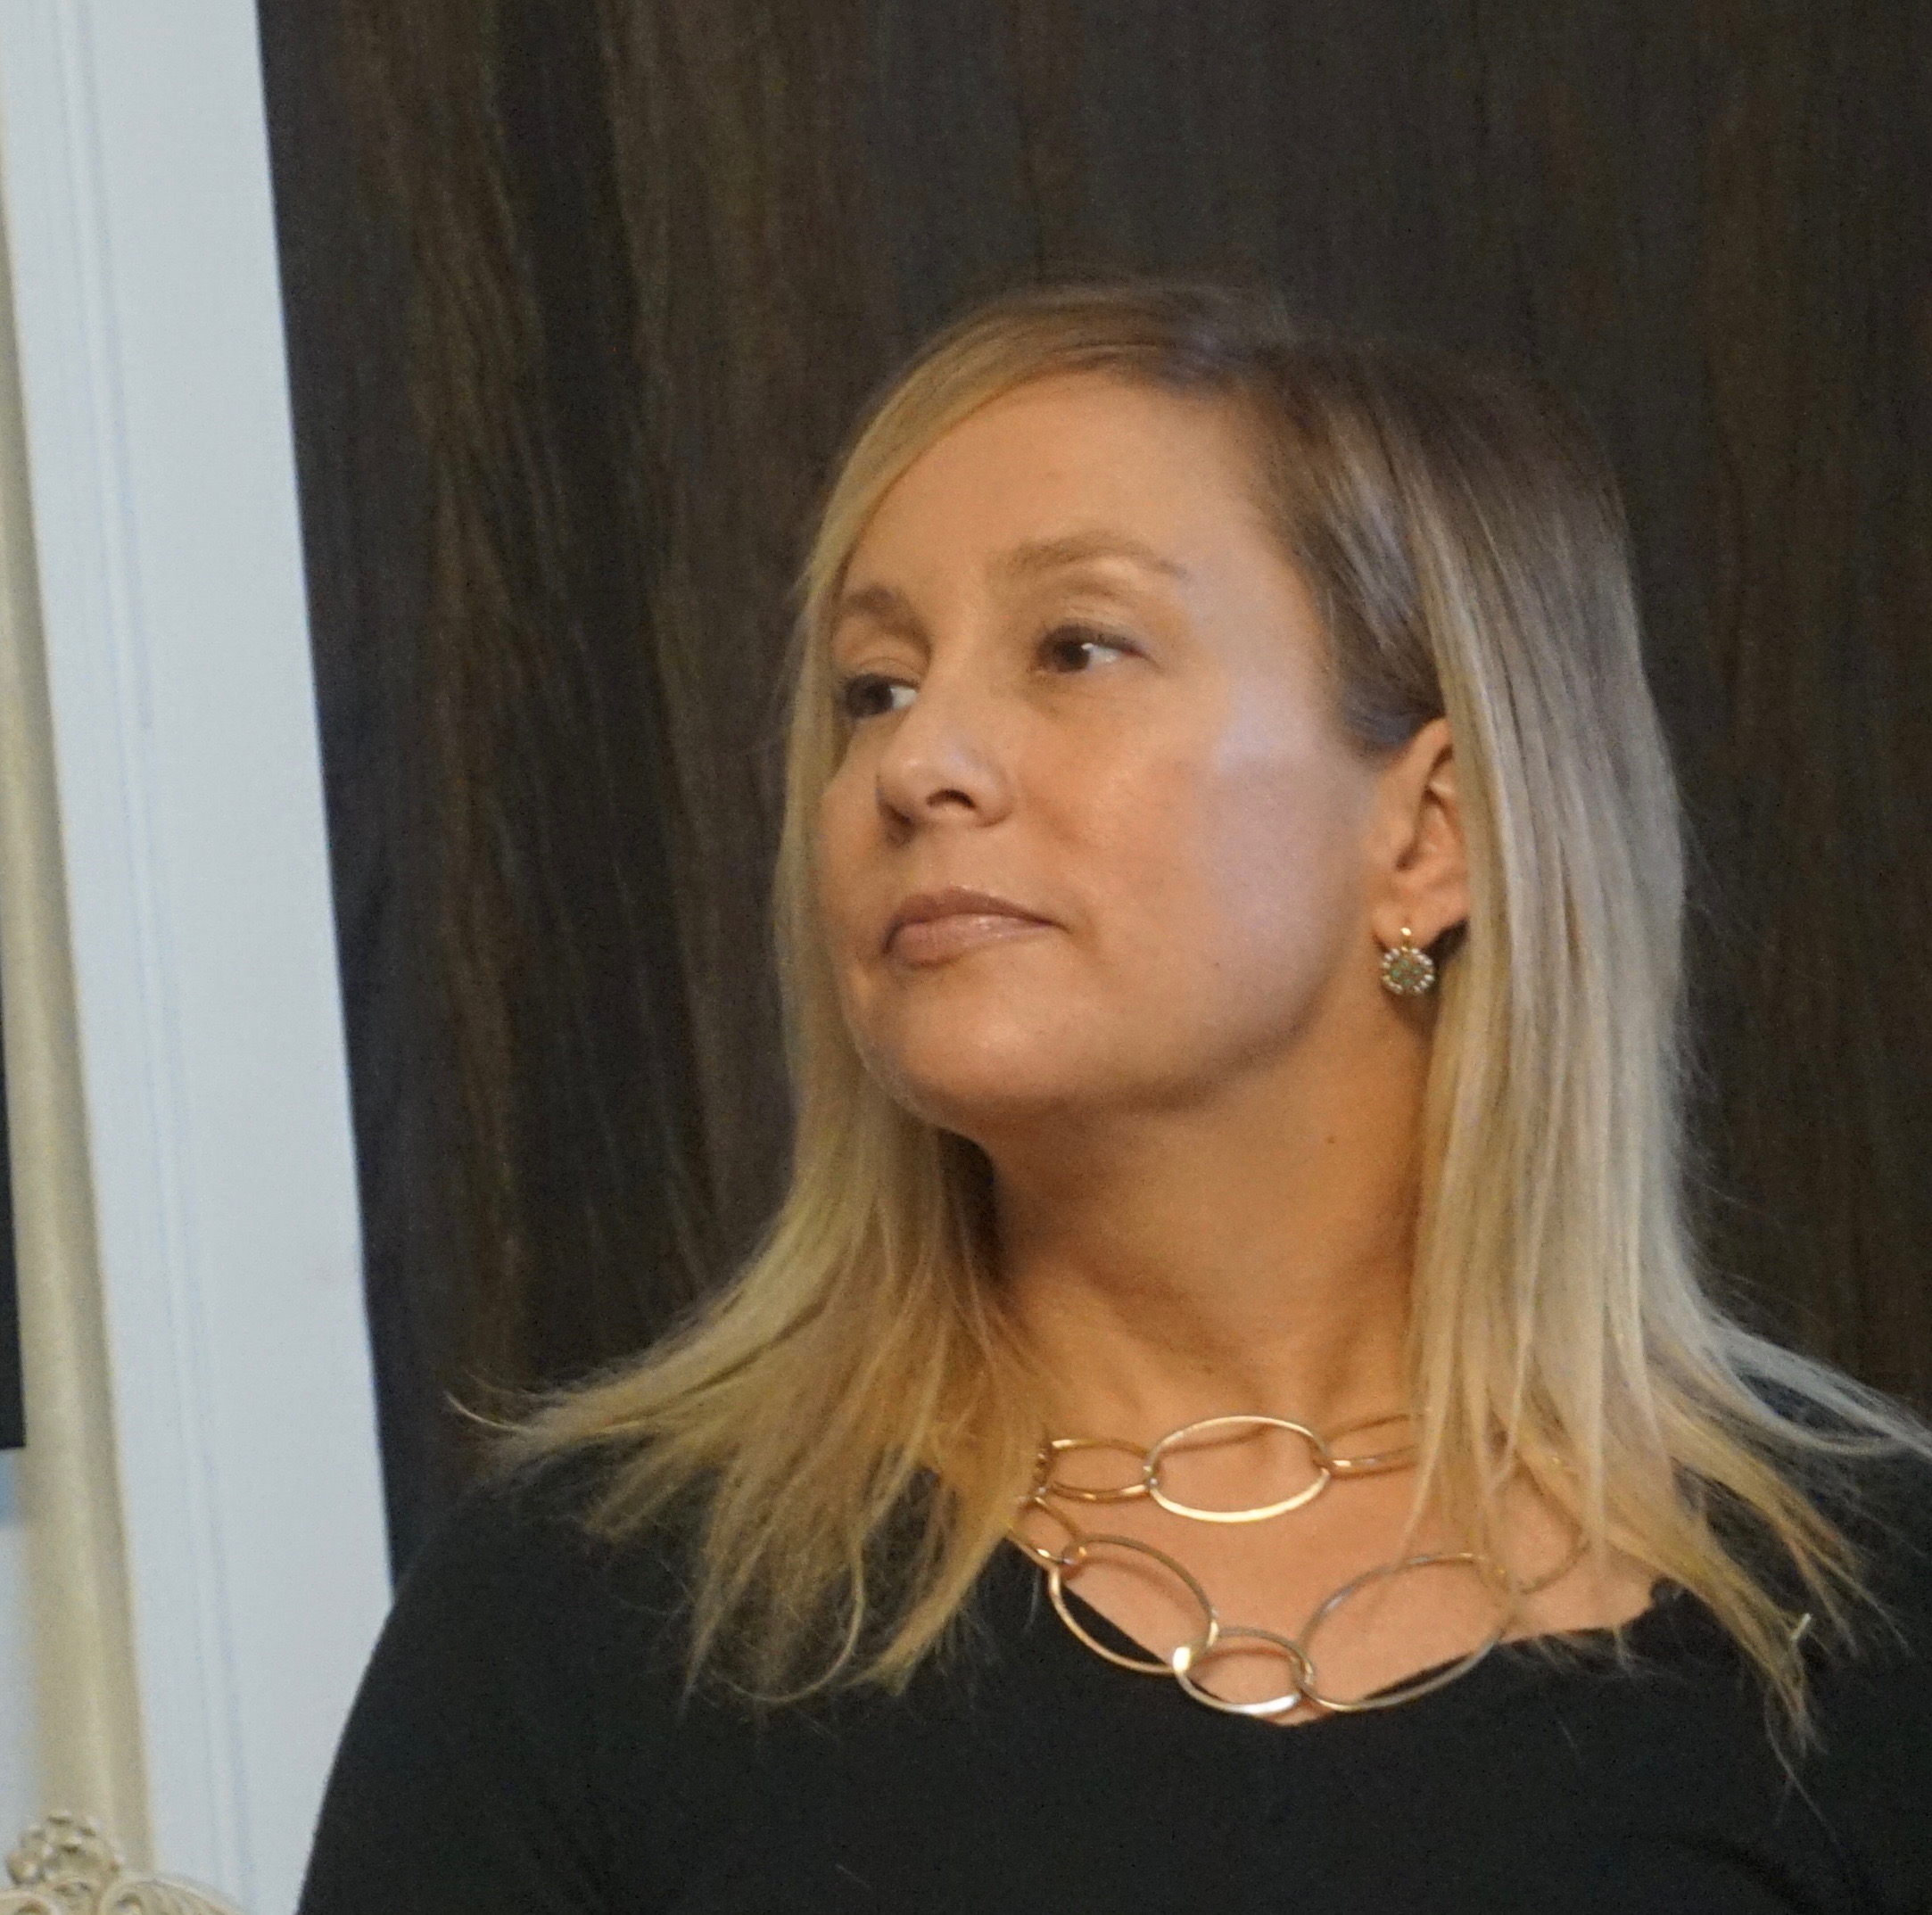 Early partnership: Dan Drew picks Liz Linehan as running mate